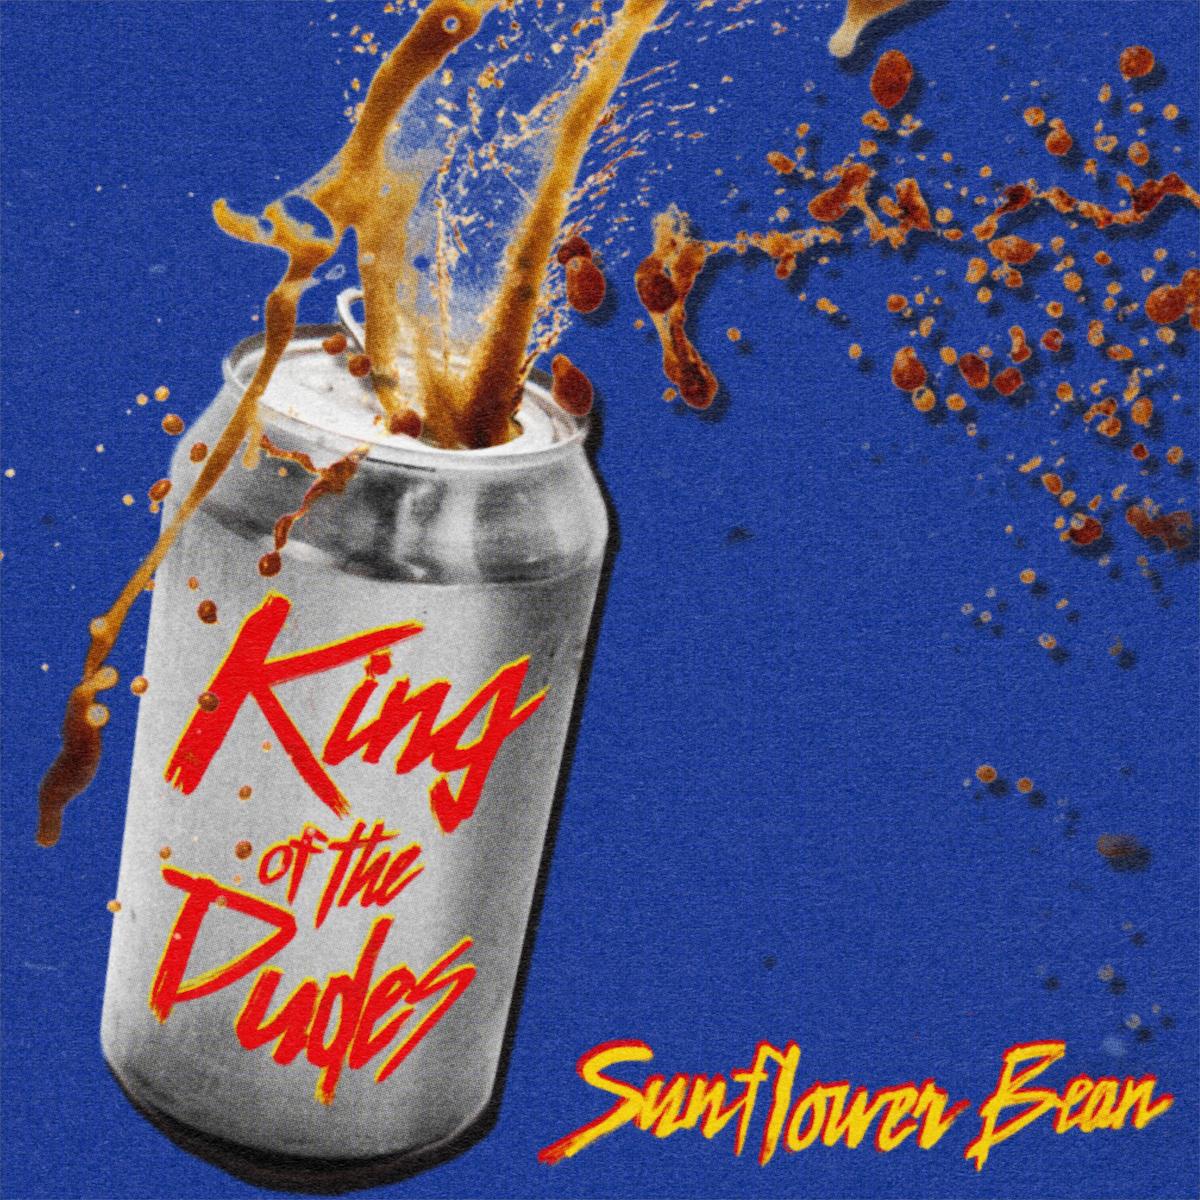 Sunflower Bean - King of the Dudes Cover Art